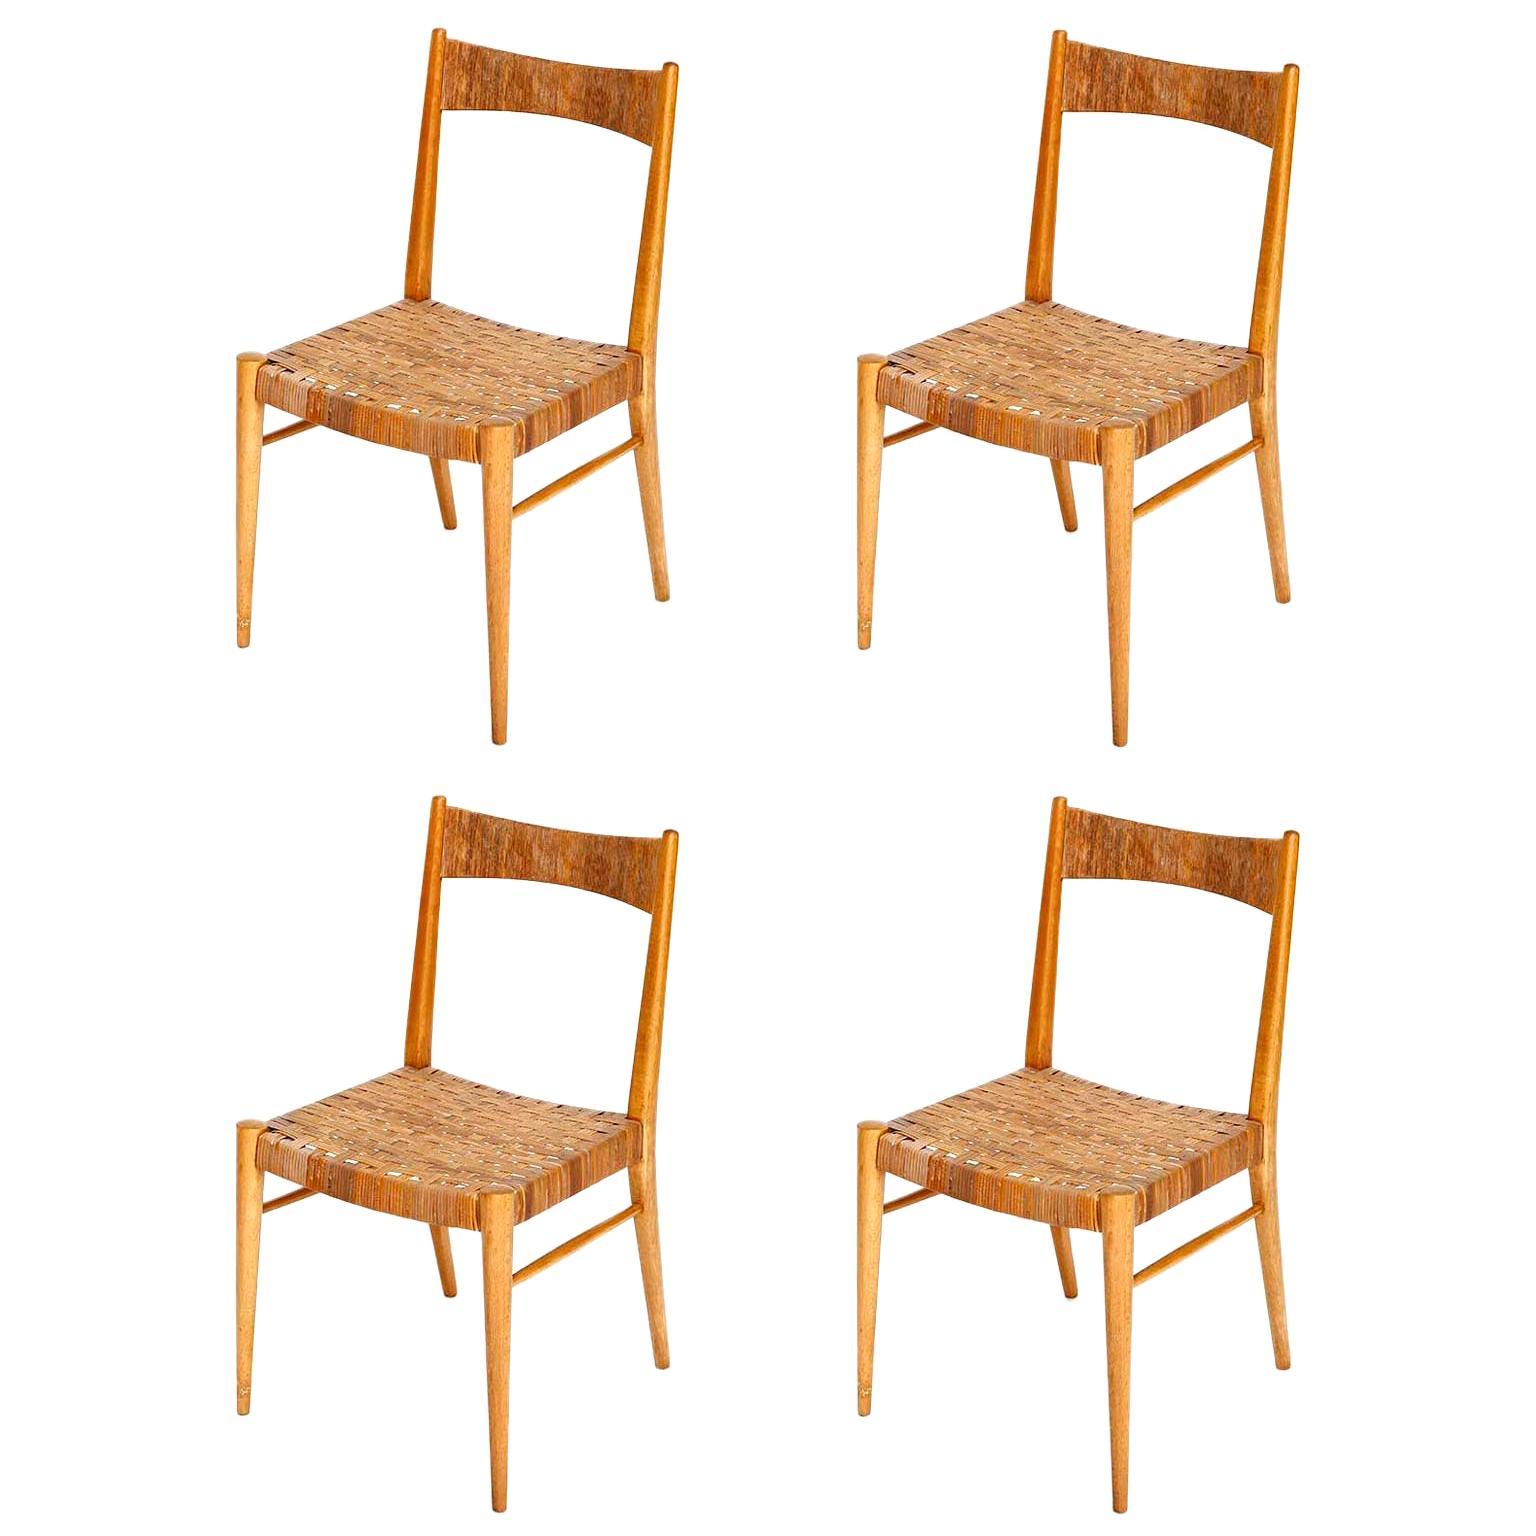 Four Anna-Lülja Praun Chairs, Wood Wicker Cane, 1950s